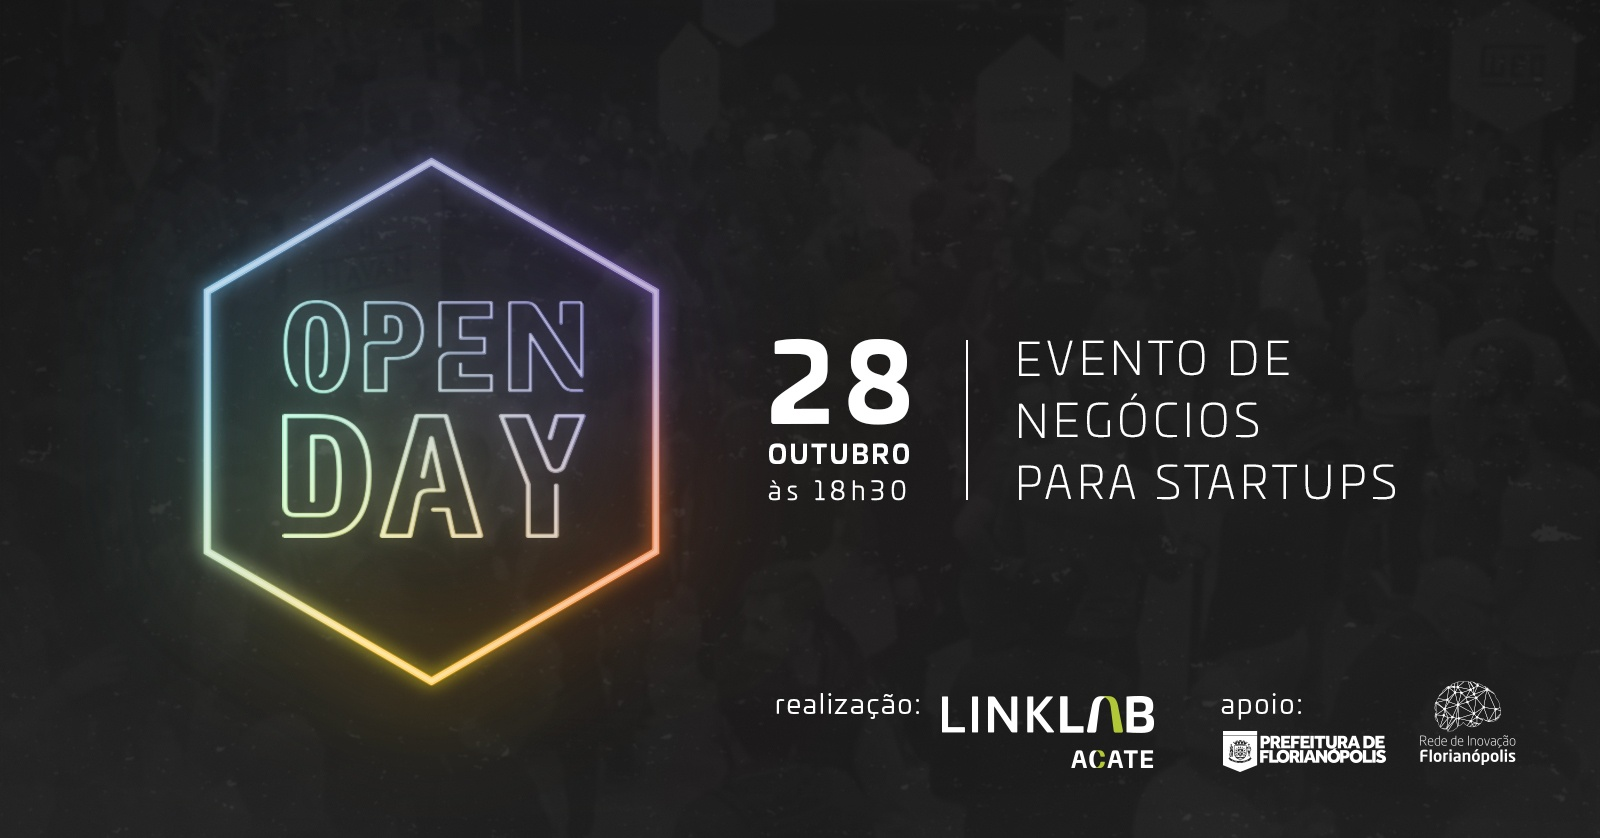 Resultado de imagem para LinkLab Open Day